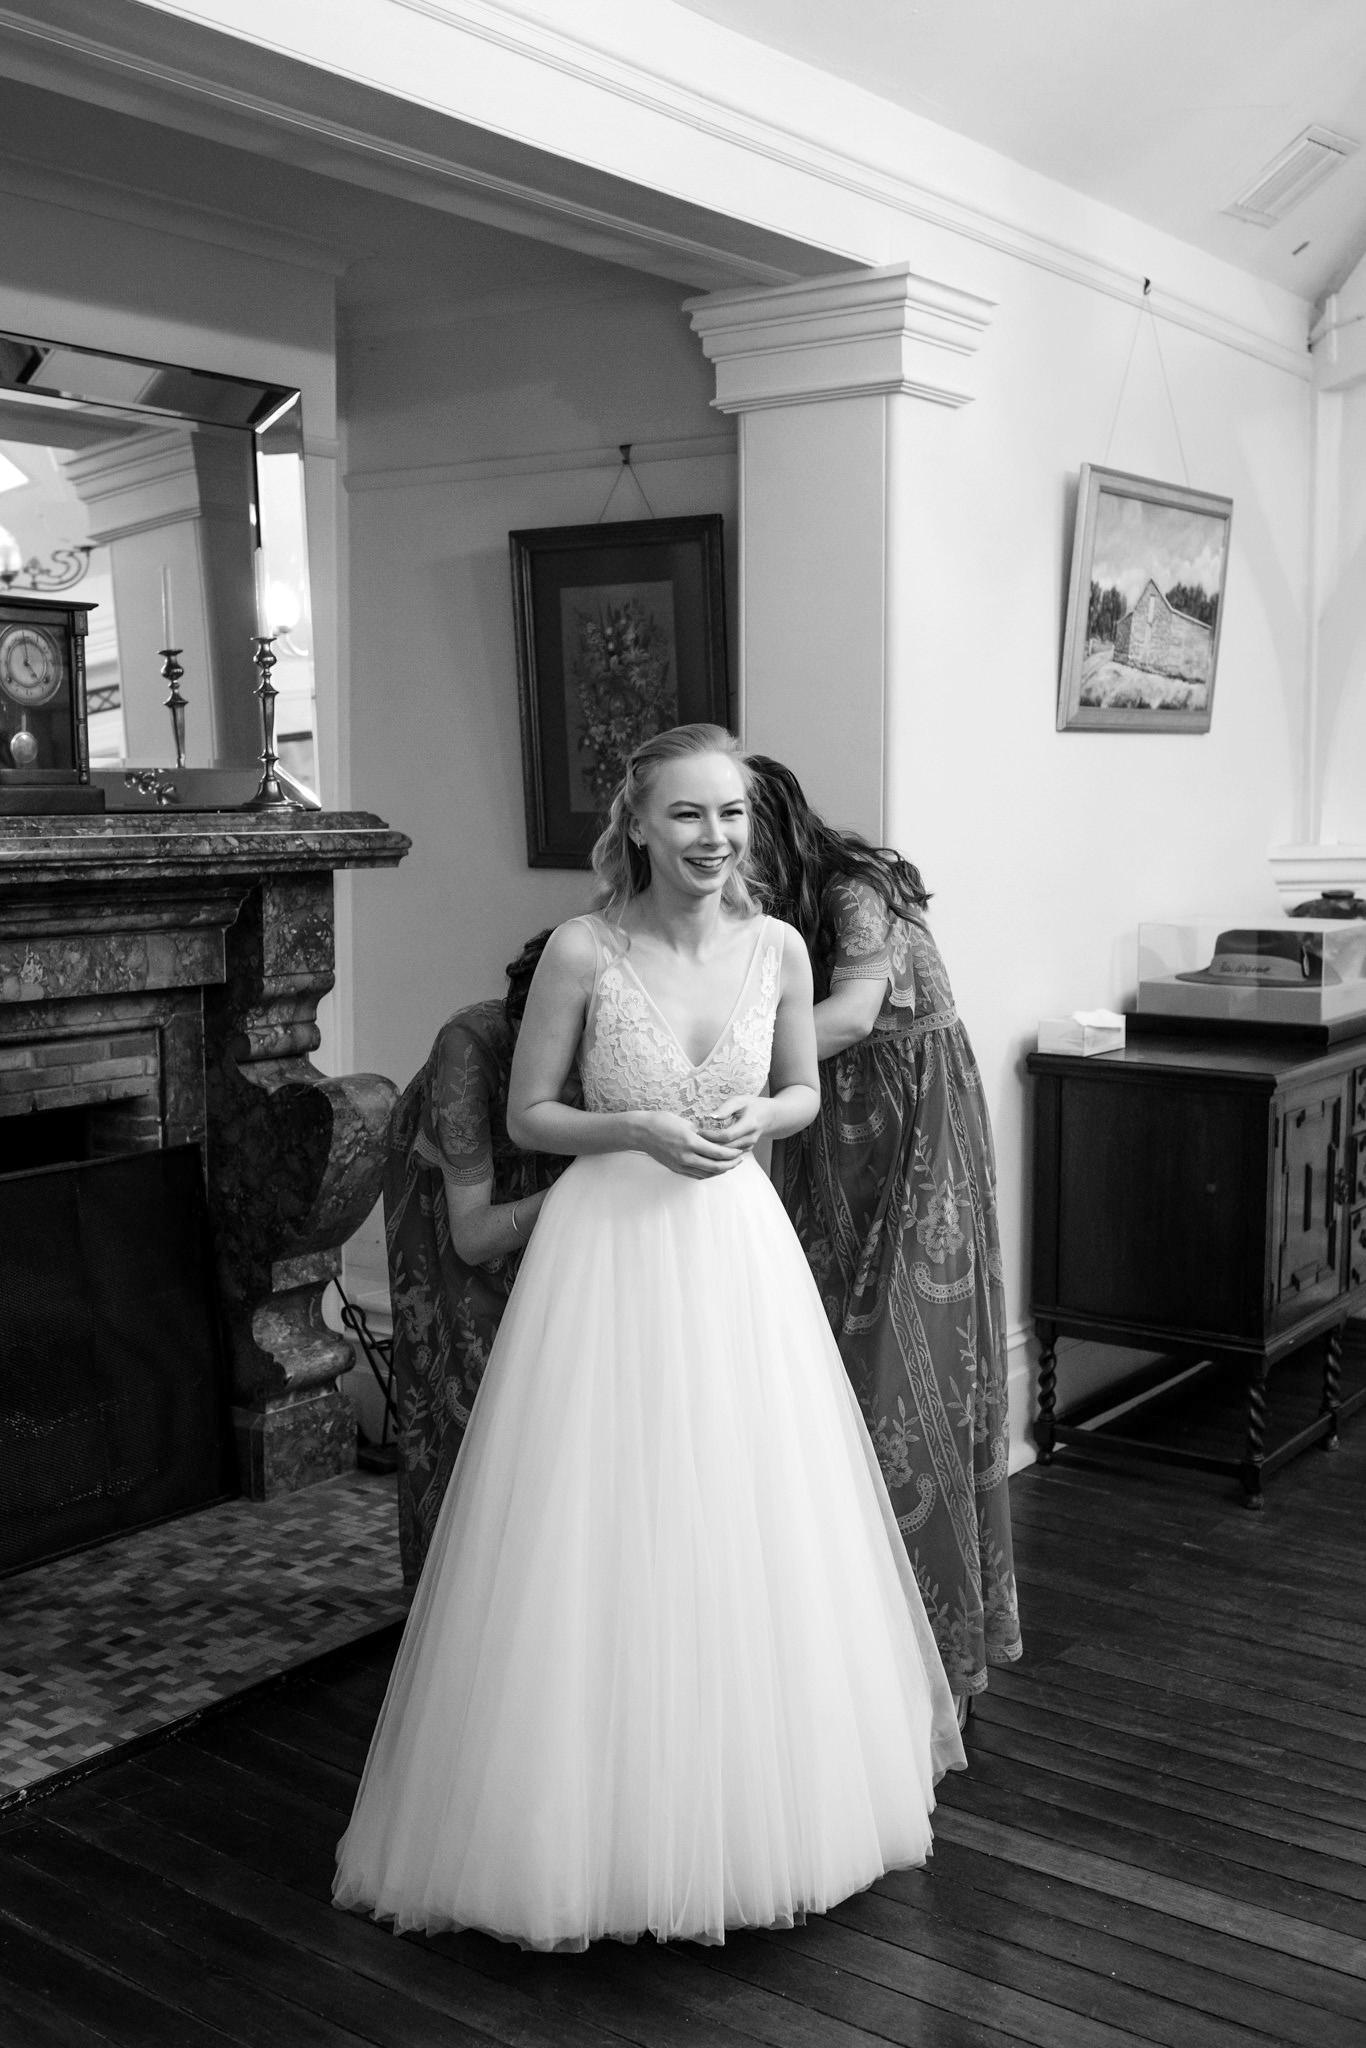 Erin_Latimore_Mudgee_Canberra_Wedding_Photographer_Tuggeranong_Homestead_032.JPG